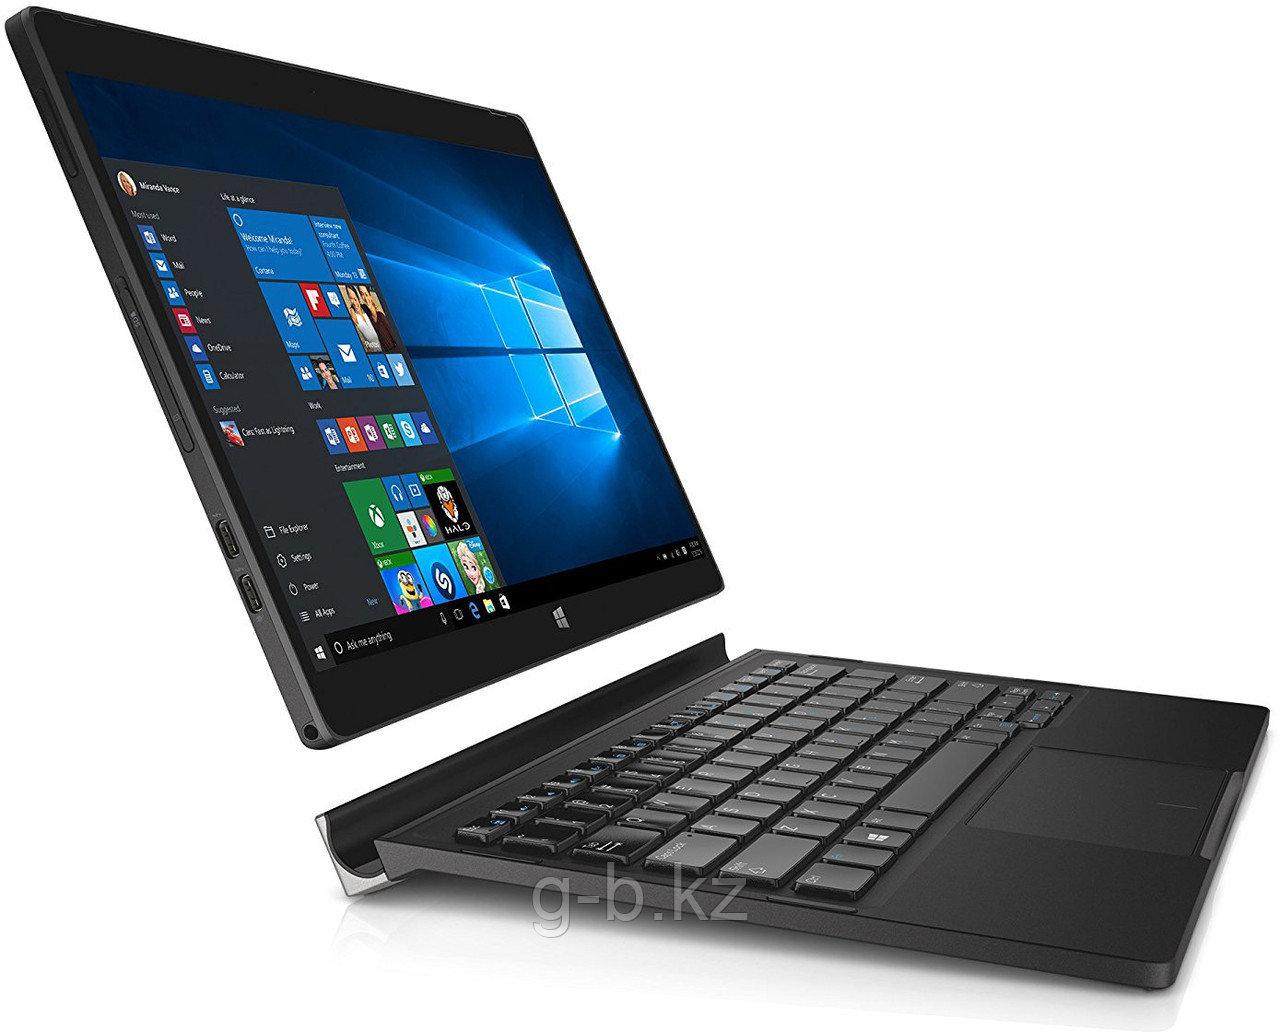 Ноутбук Dell 12,5 ''/Latitude 7275 /Intel  Core M  m7-6Y75 1,2 GHz